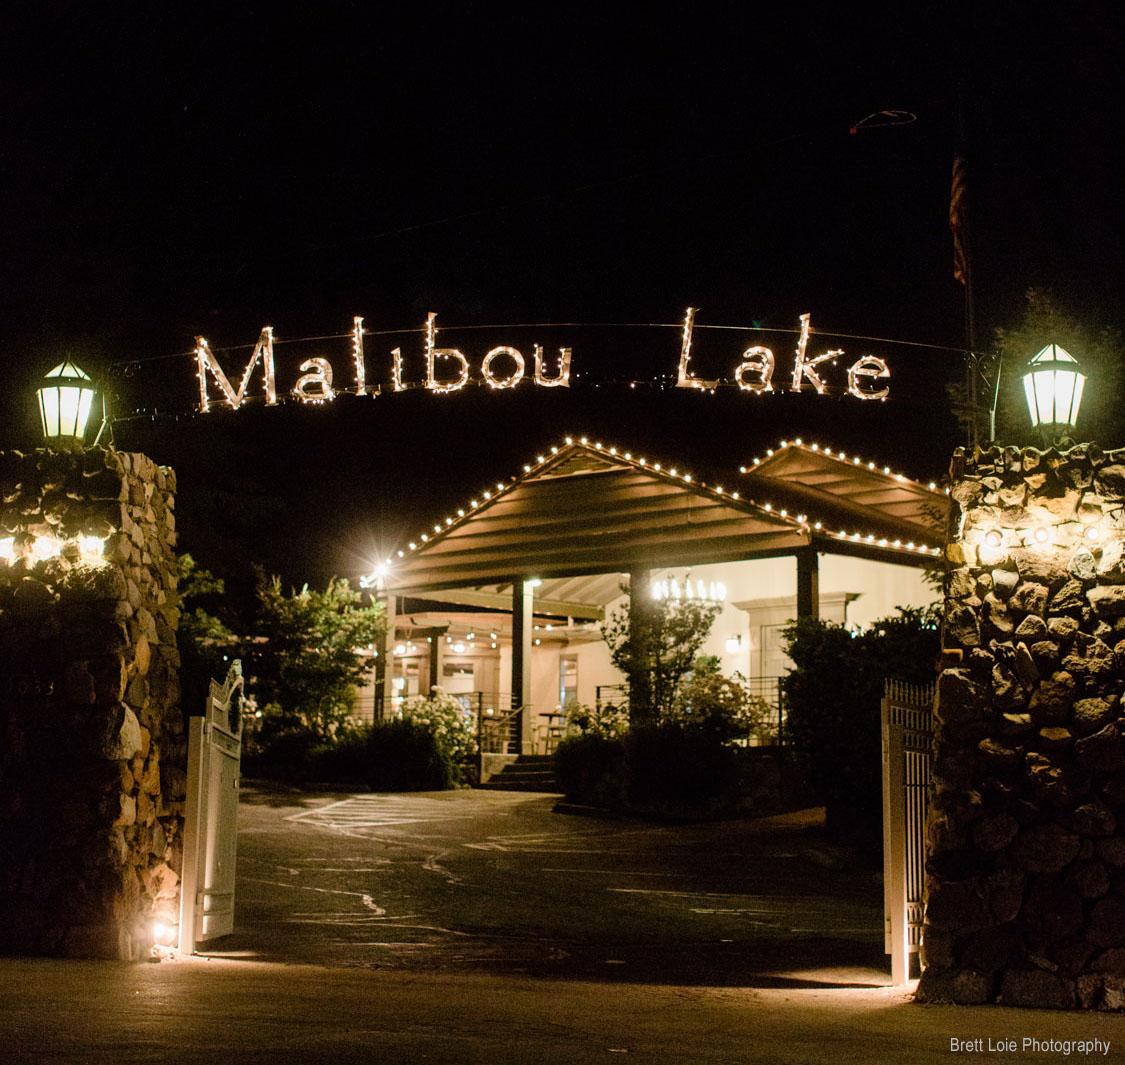 malibou-lake-wedding-venue-malibu-event-planner-113-watermarked.jpg